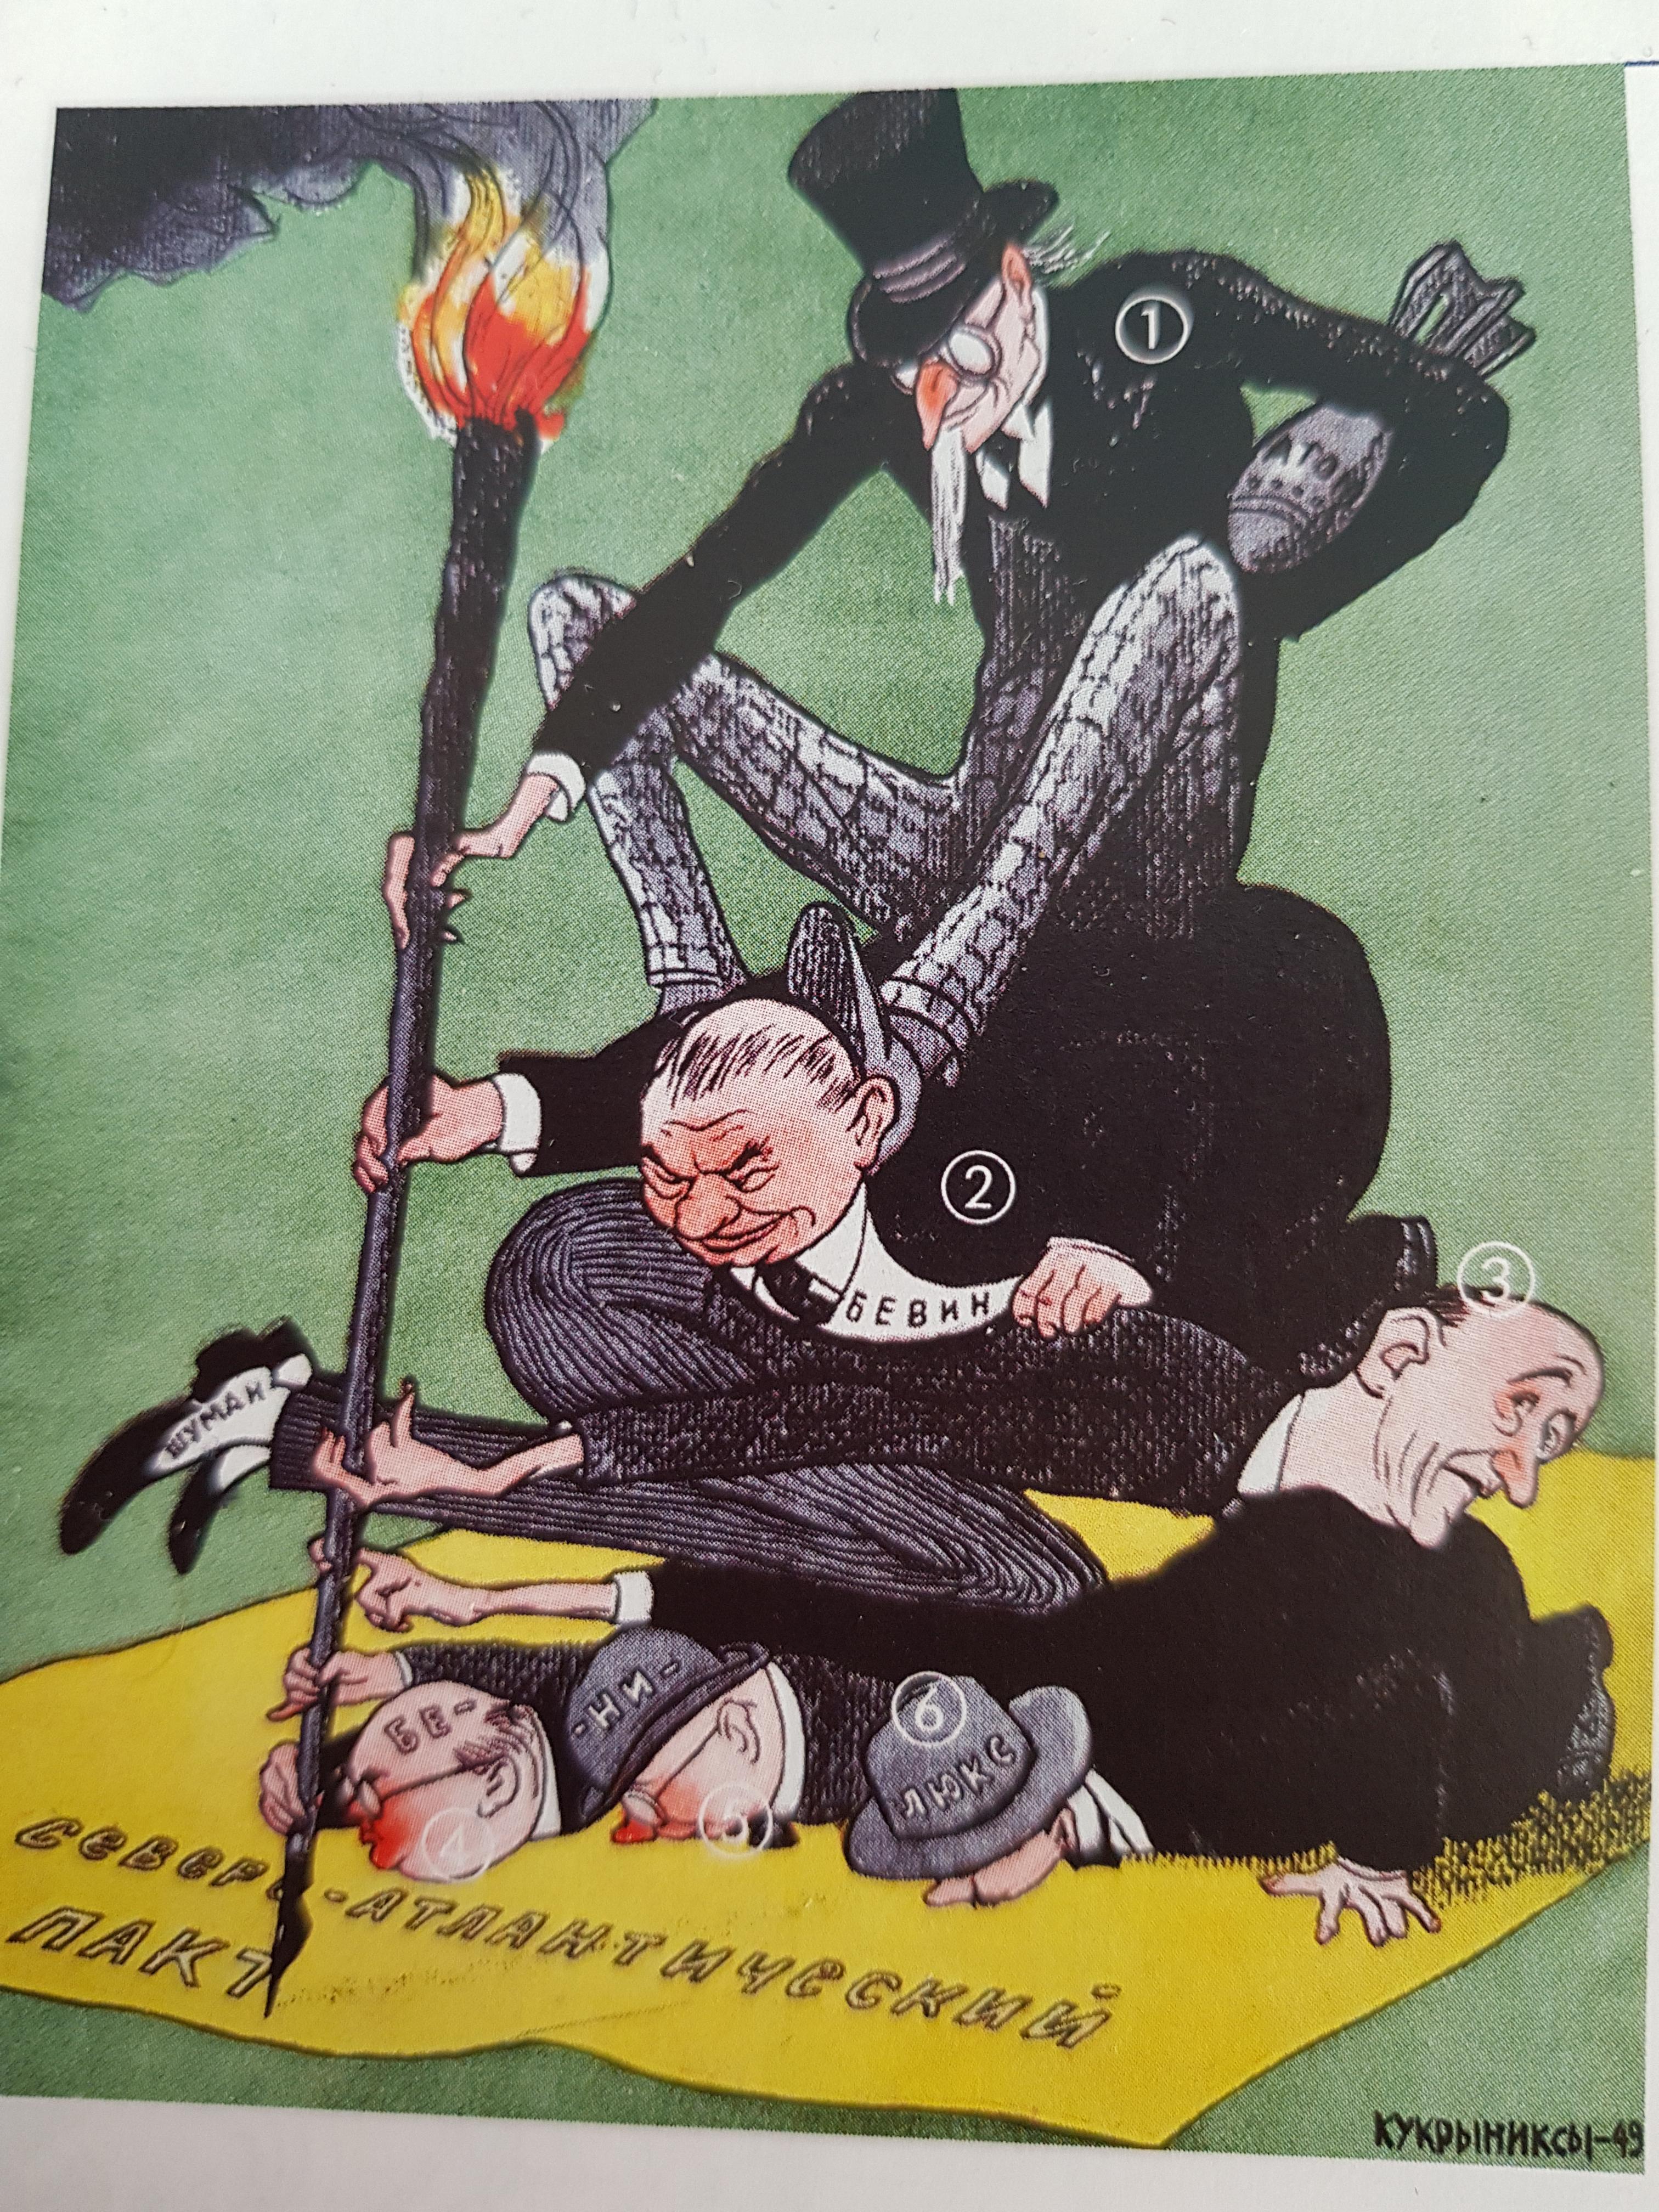 Geschichte -> Nordatlantischer Pakt, Karikatur beschreiben